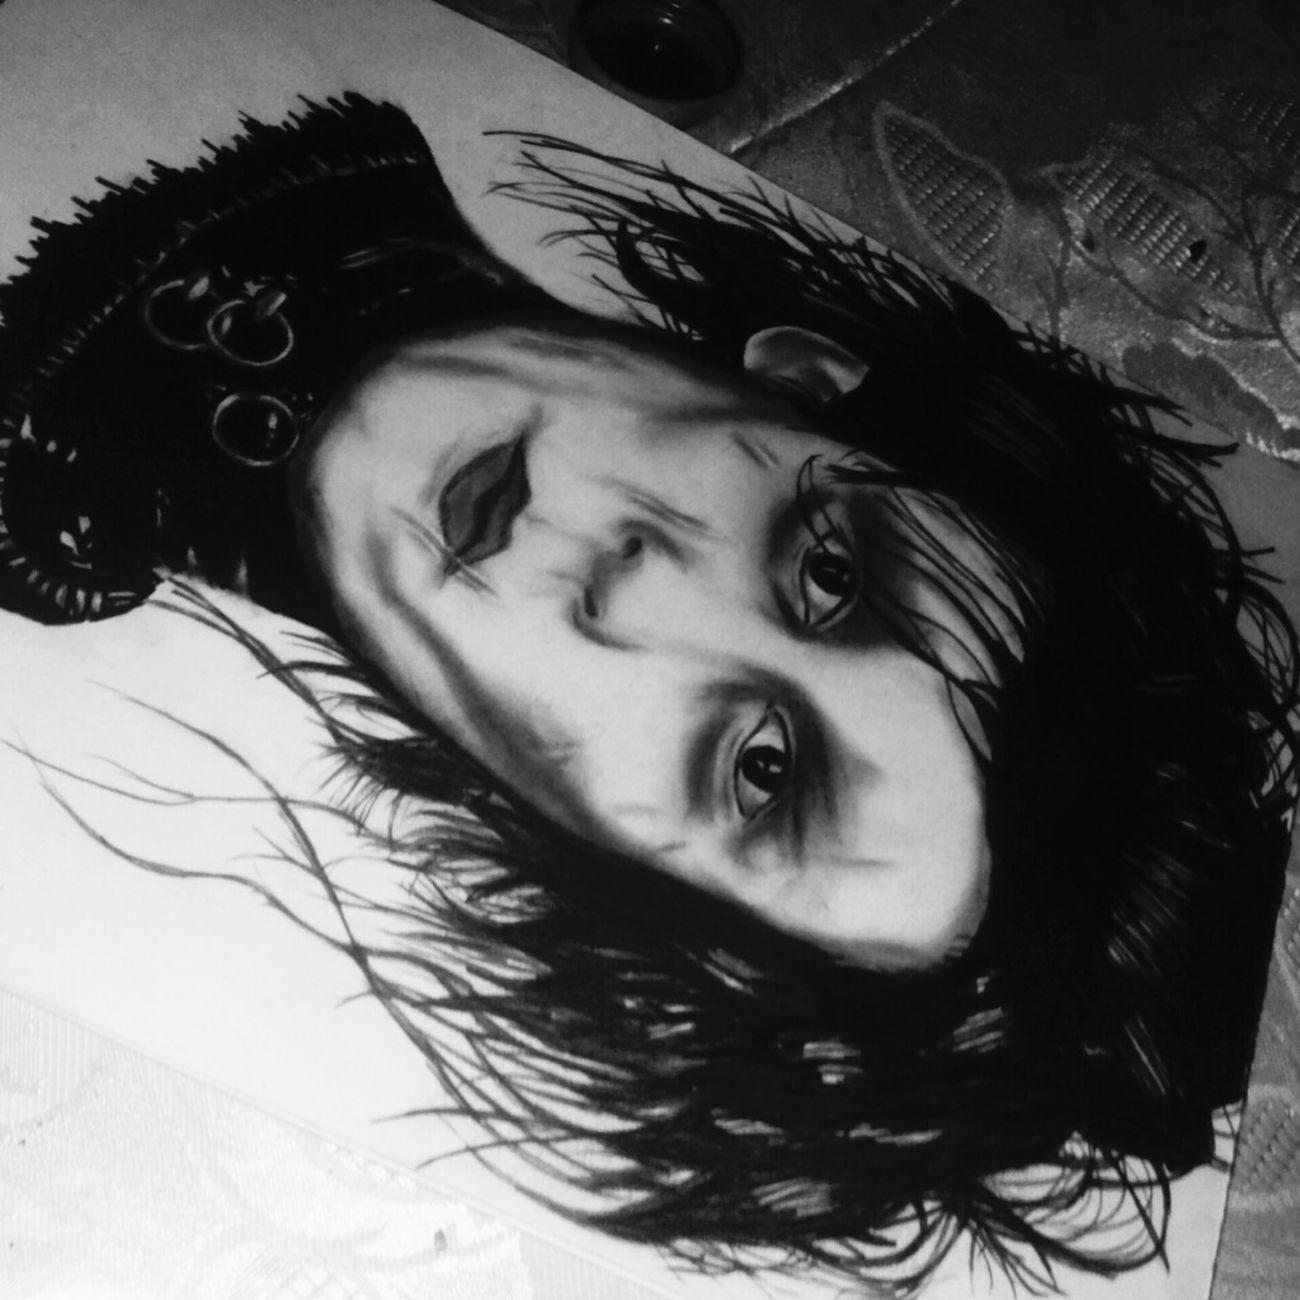 Dibujo A Lapiz Esquizofrenia Follow4follow Depressive Dibujando Followback Ojos Bonitos  Antiguo Followme Dibujotime Dibujoartistico ElDibujante Carboncillo Tristeza Artist Happiness Darwing Negro Hombre Manos De Tijera Brad Pitt Johnny Depp Desnudoartistico Anime Art Cuadros